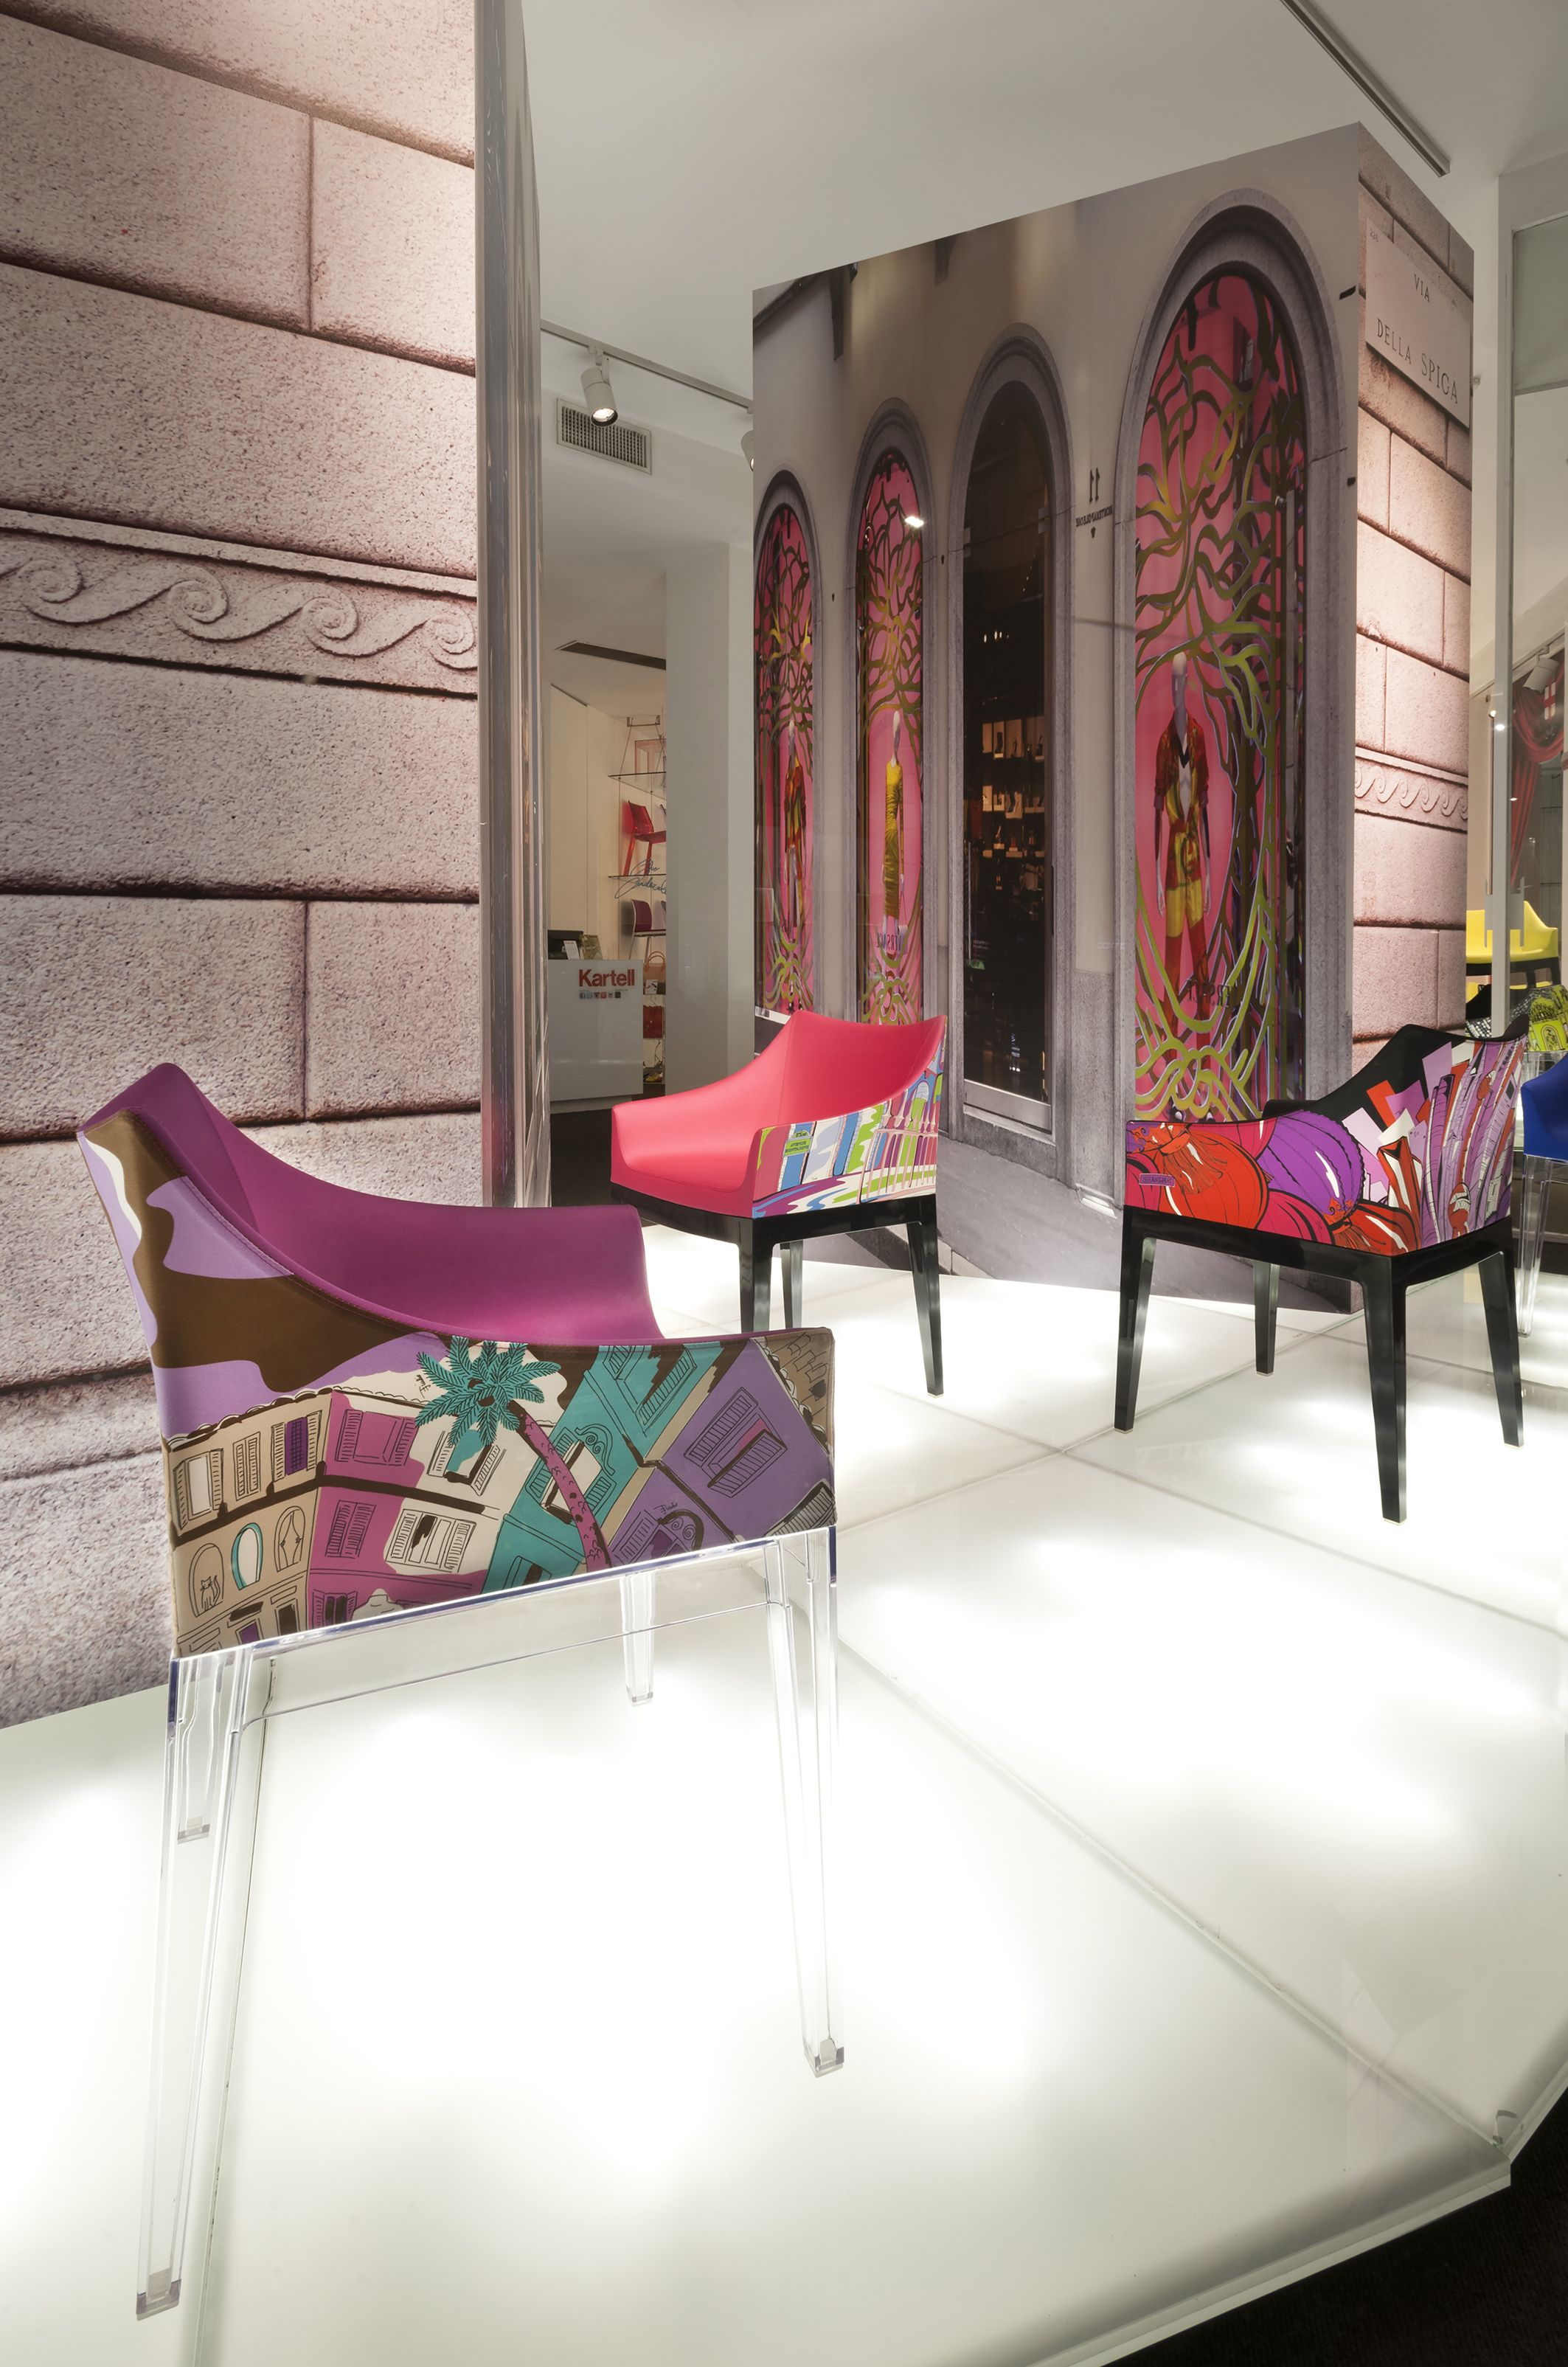 Philippe Starck White Interior - Madame world of emilio pucci edition design philippe starck